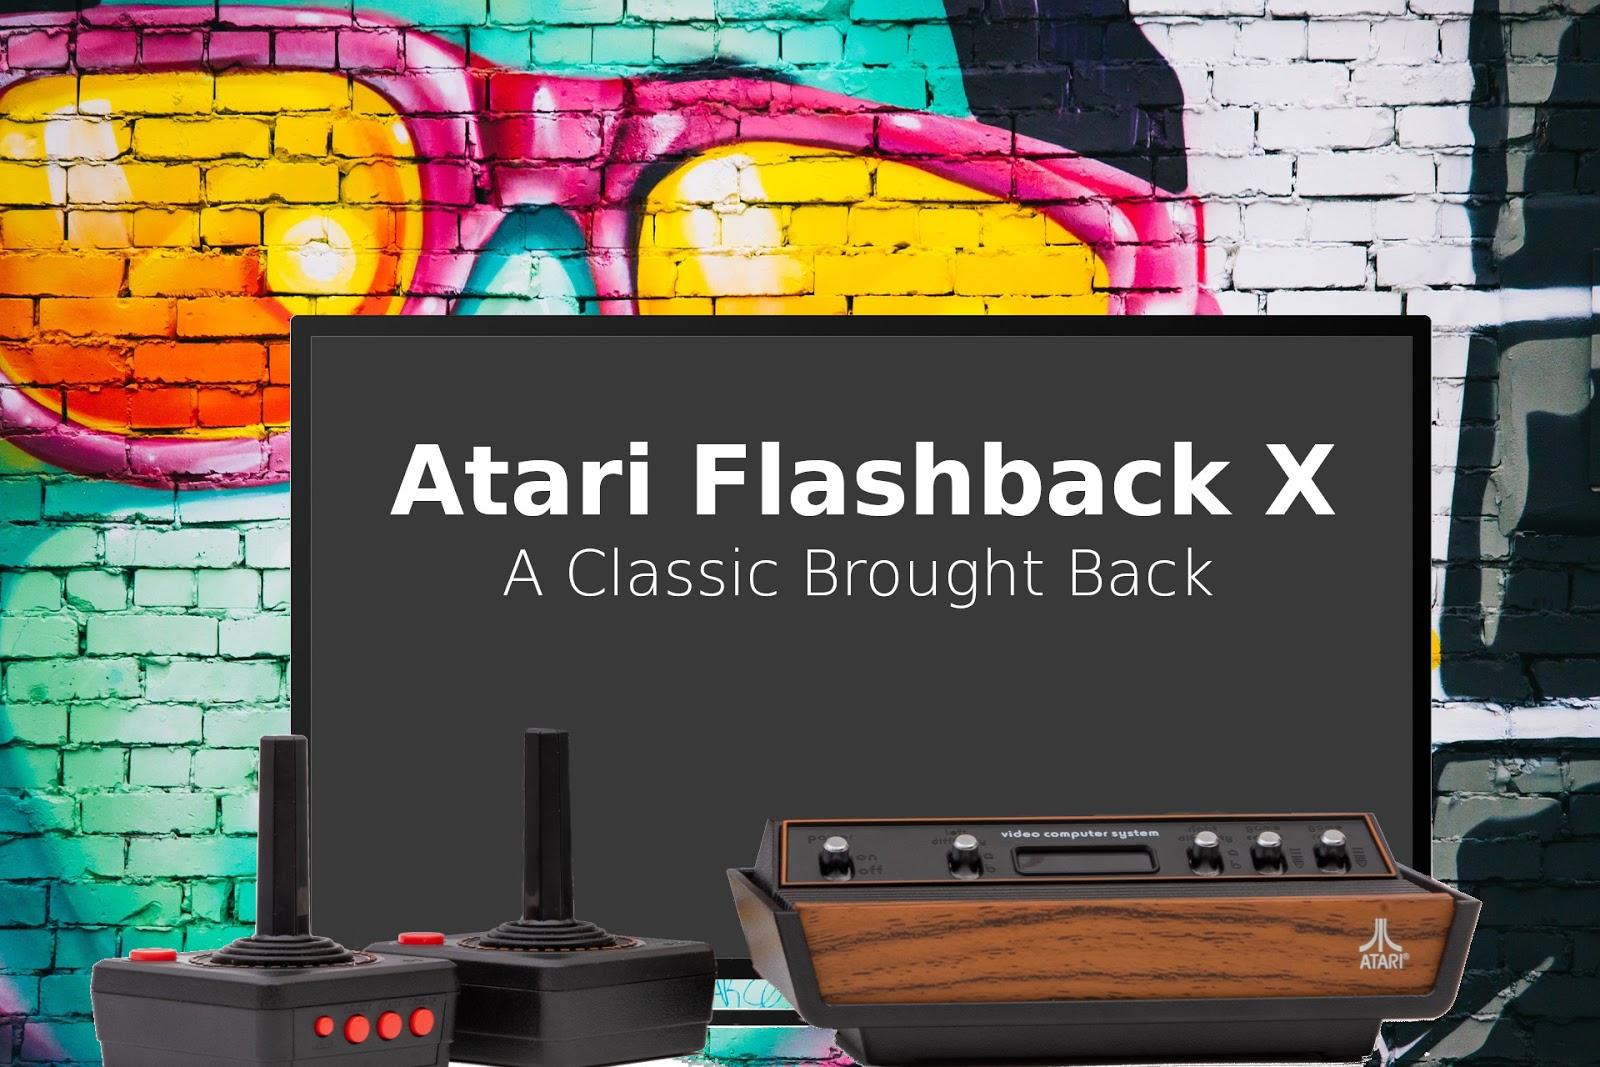 Atari Flashback X: A Classic Brought Back